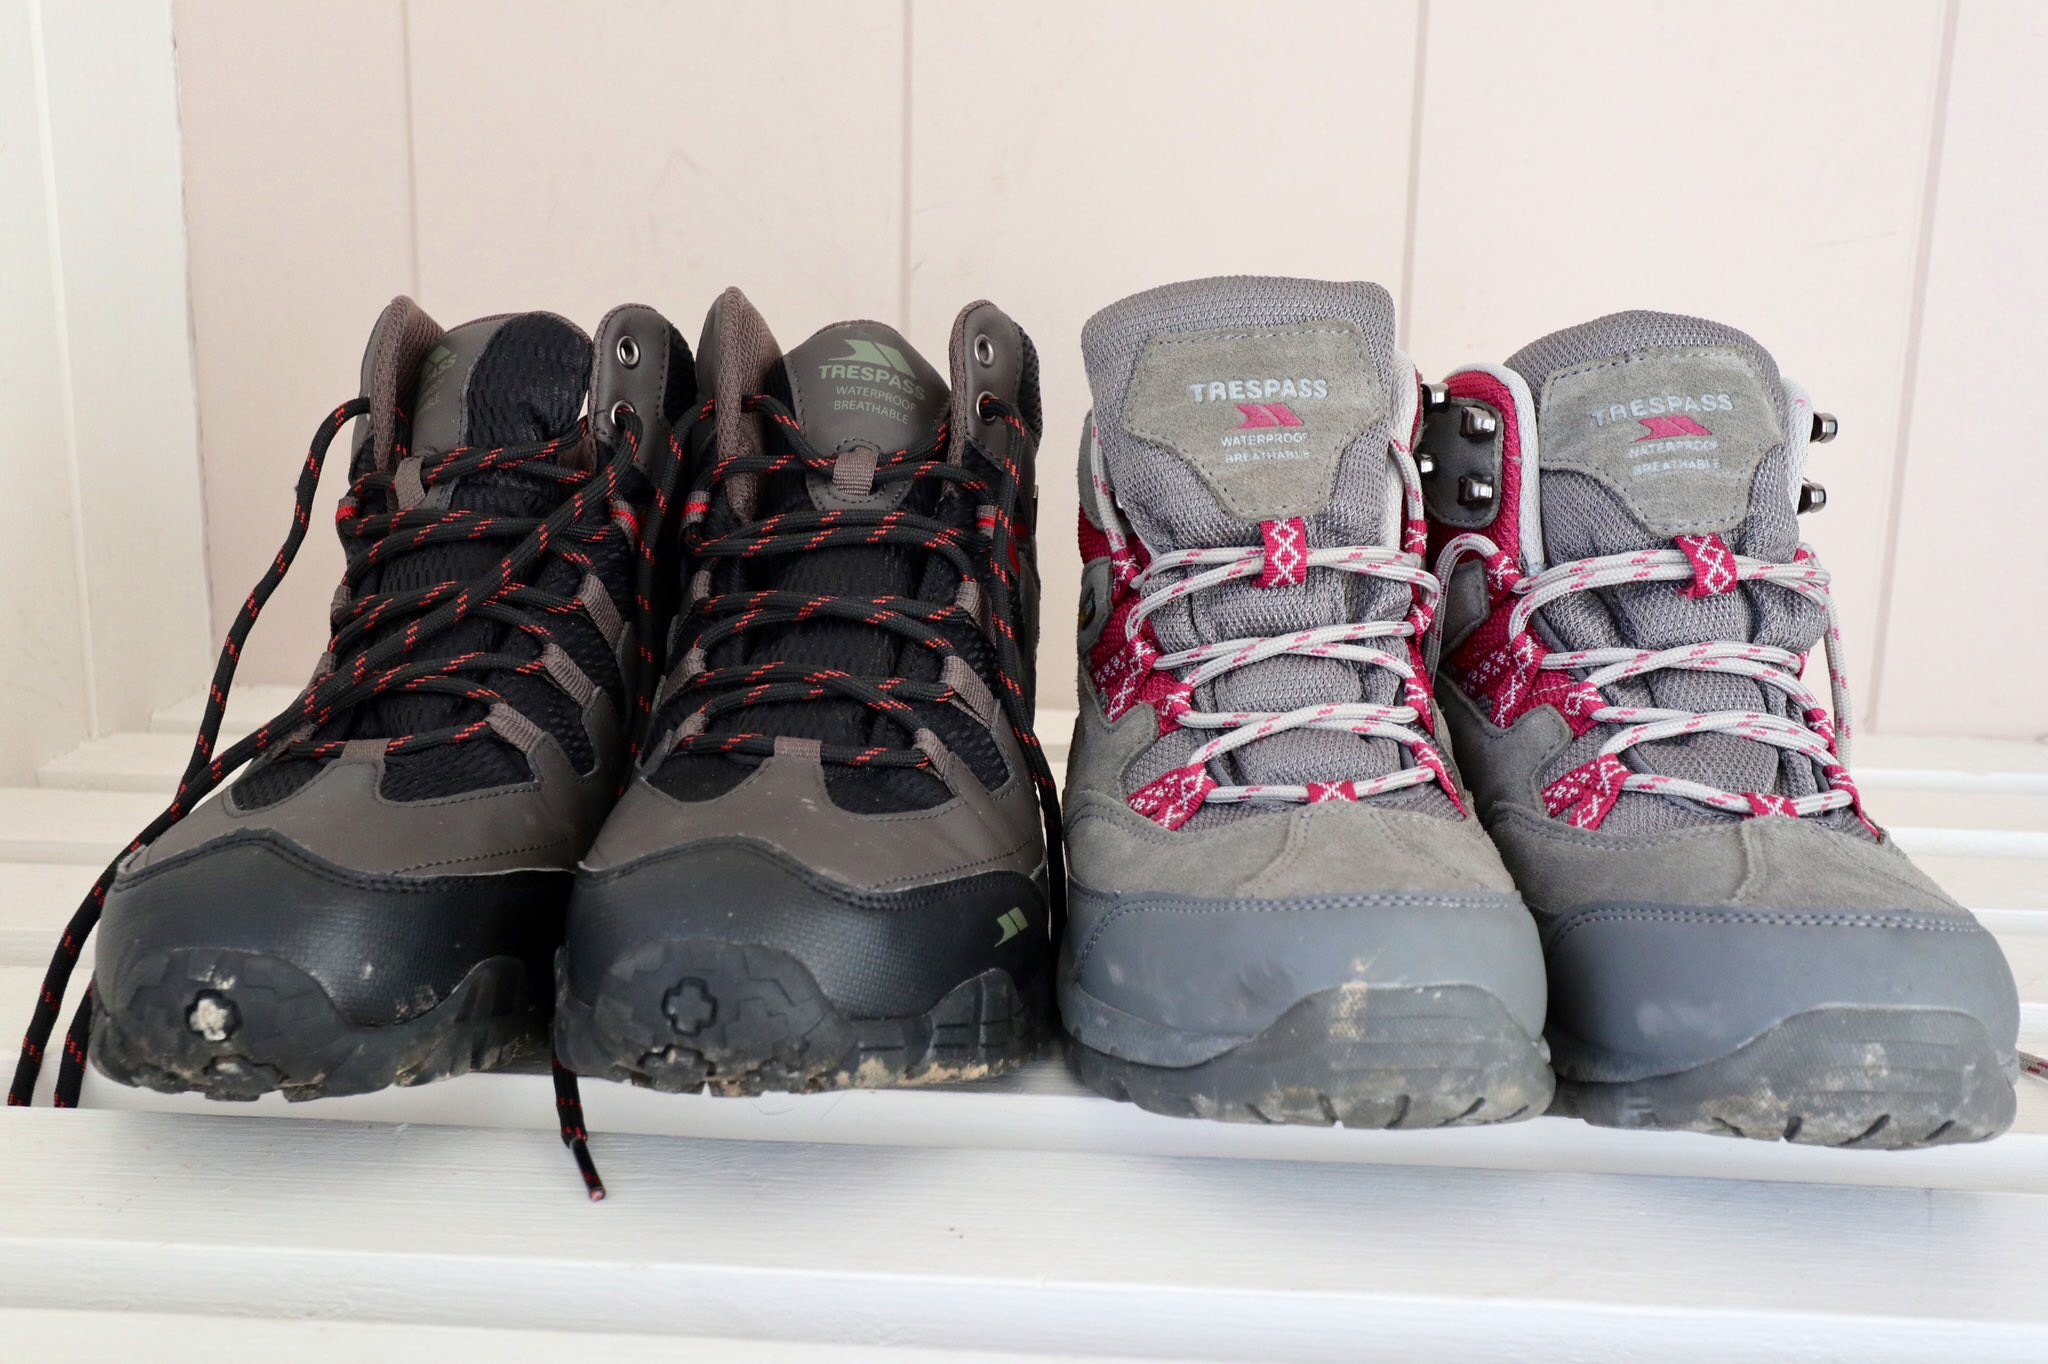 Walking Boots at Keswick Reach Lodge Retreat, The Lake District